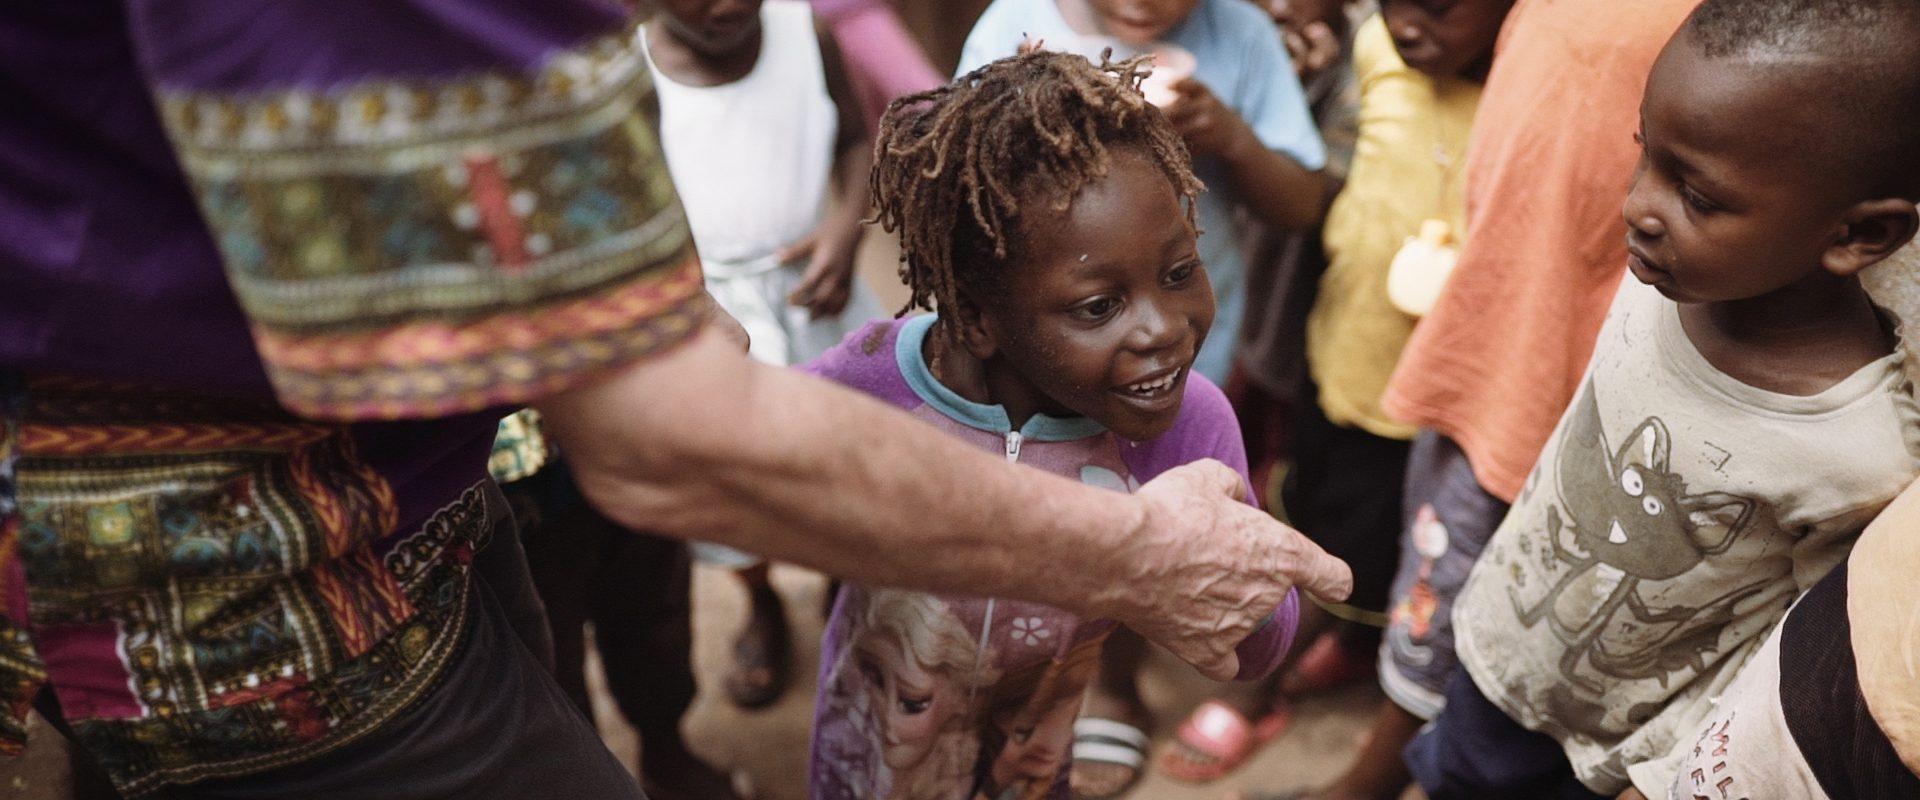 Sierra Leone_frame69